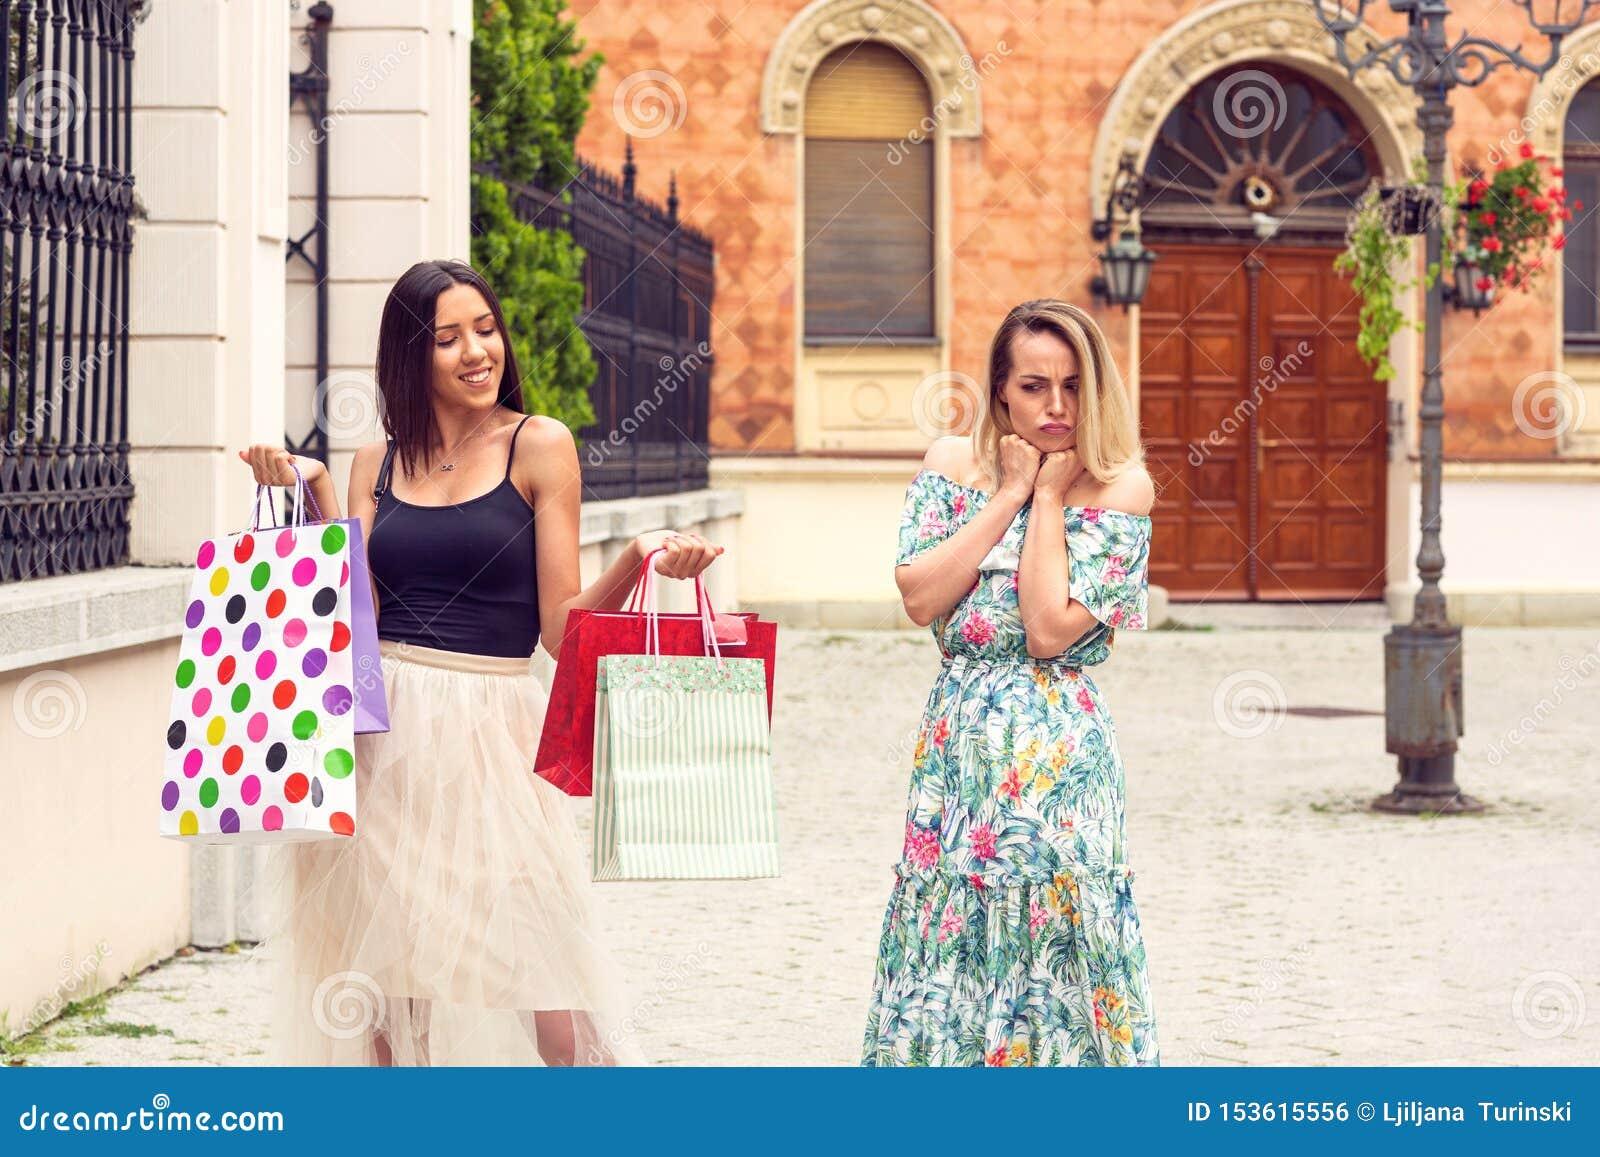 Sad and happy women at shopping